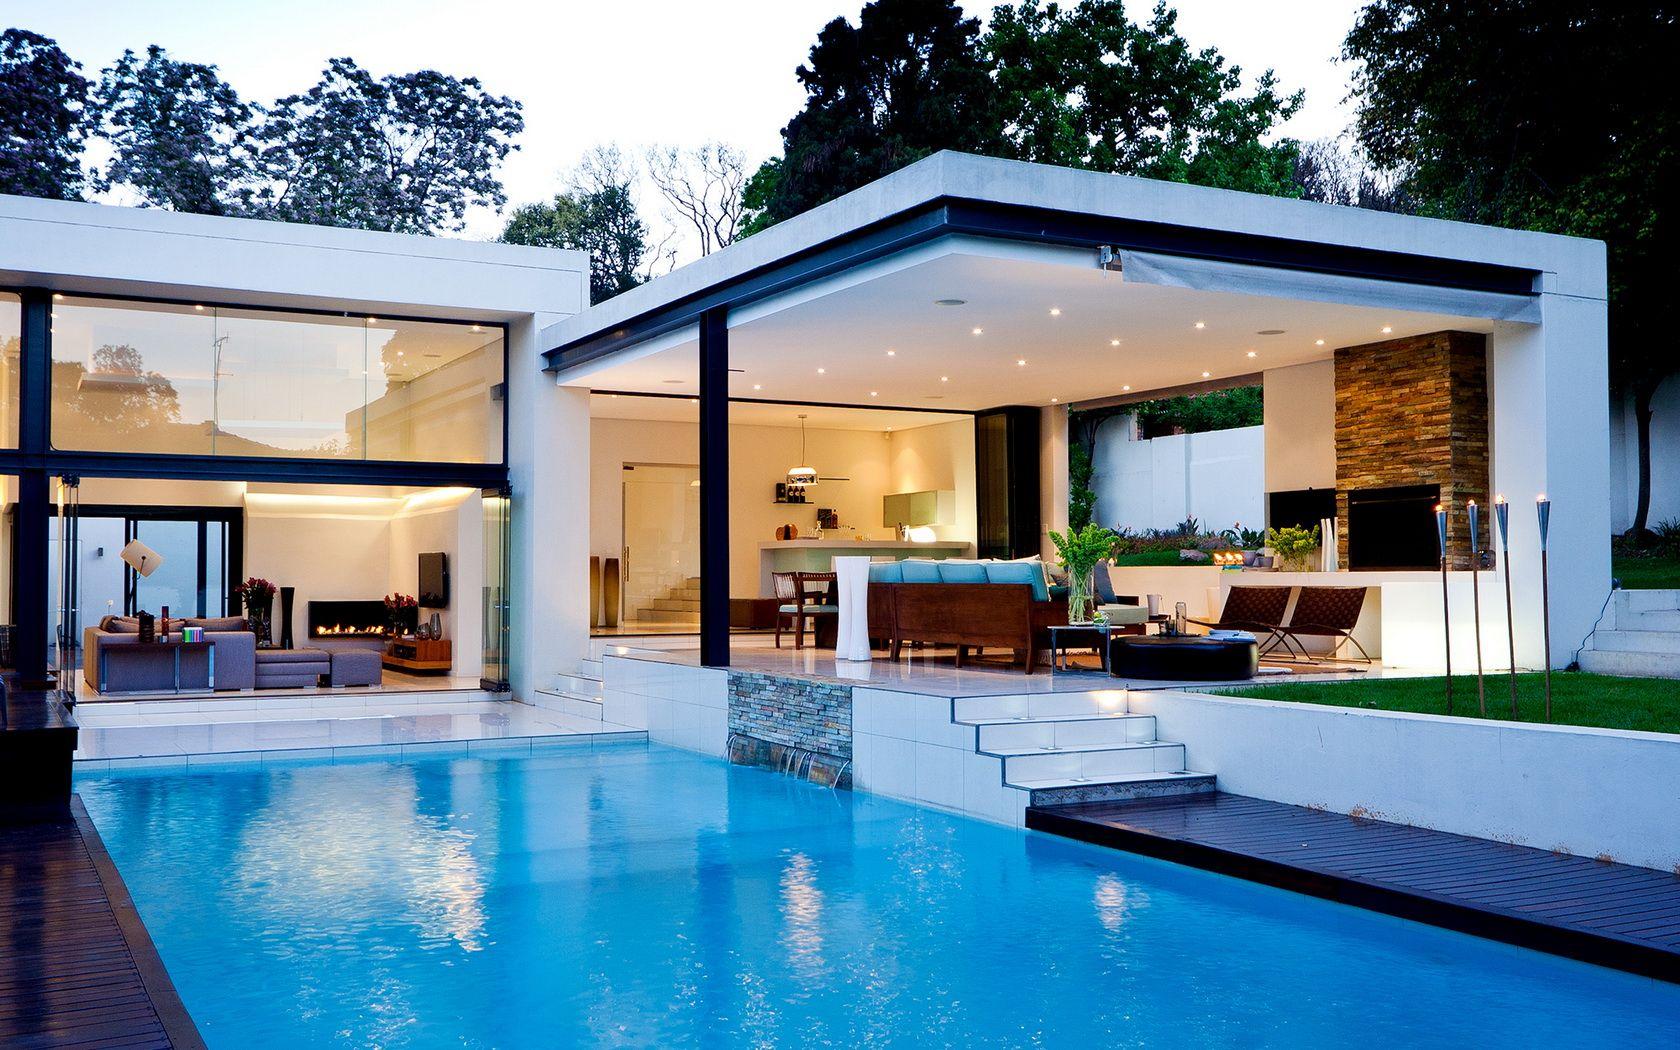 Modern Pool House modern design pool house - house interior